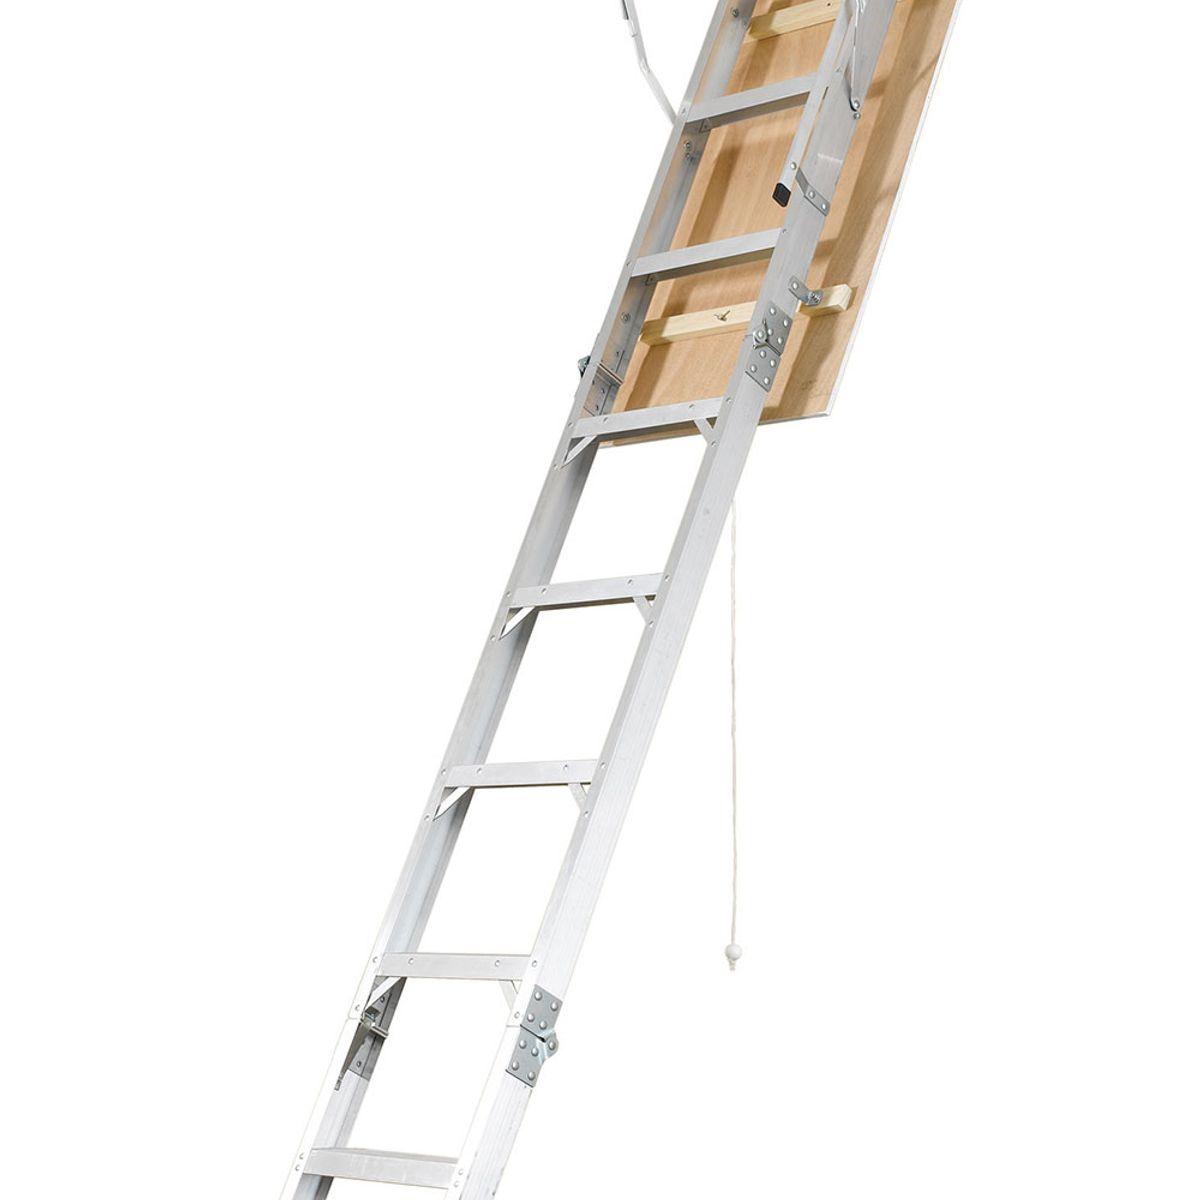 AH2210 22.5in W X 54in L X 8ft To 10ft H Ceiling Aluminum Attic Ladder